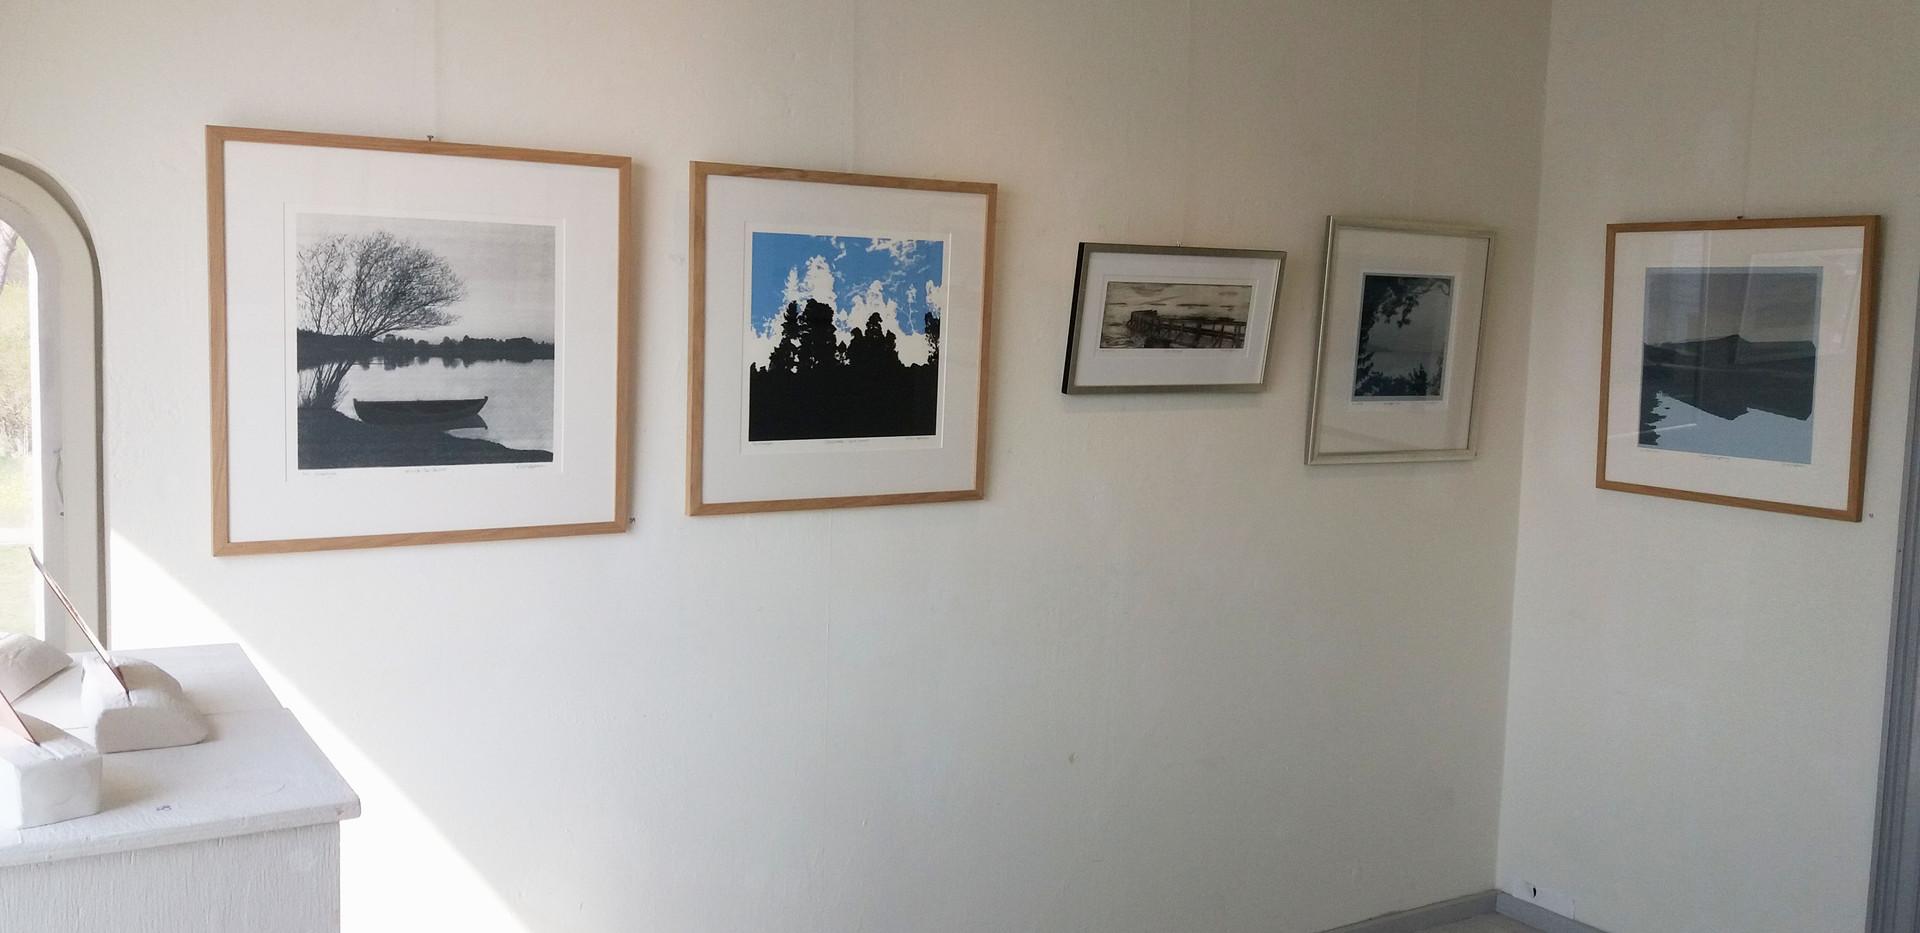 Kirsti Aasheim/ Screenprinting/ Drøbak Kunstforening